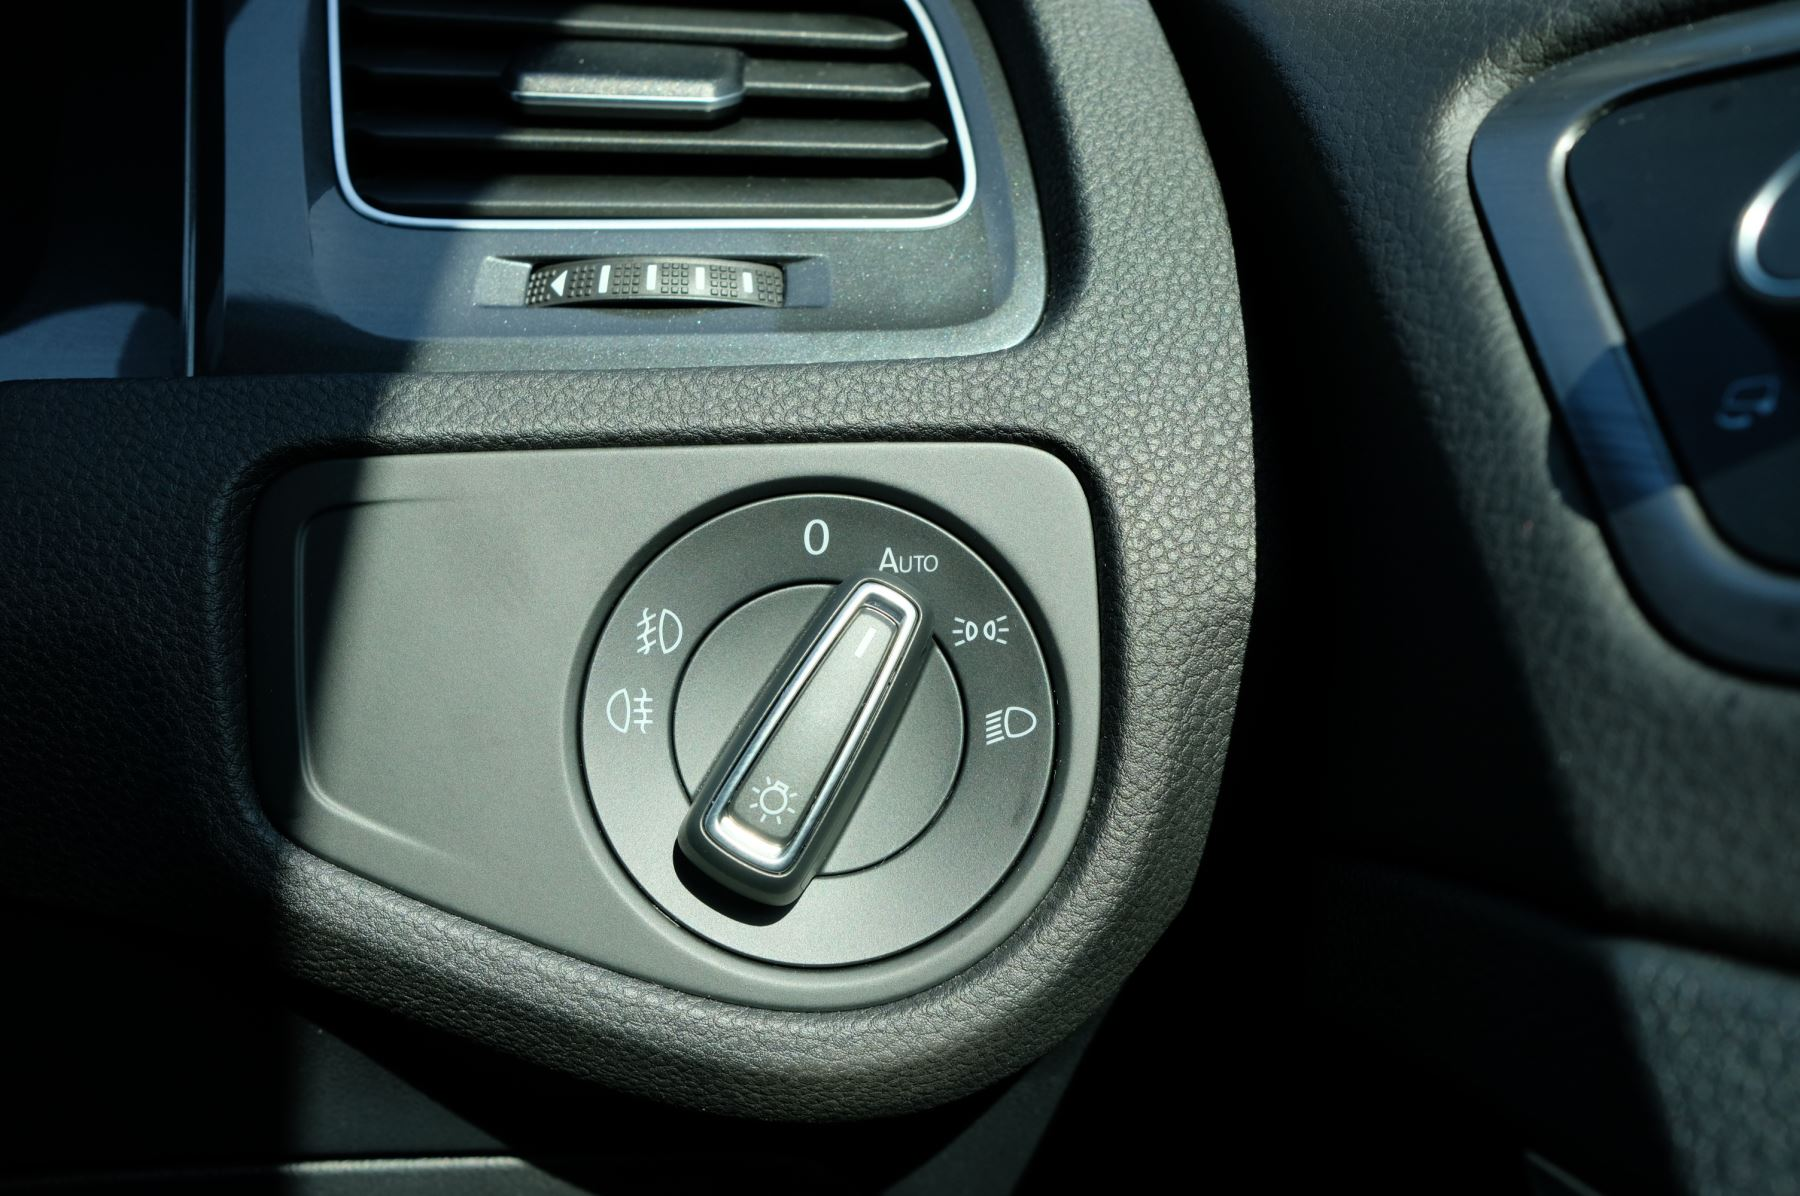 Volkswagen Golf 1.5 TSI EVO 150hp Match 5 Door DSG Auto with A/Con, Sat Nav, Alloys & Adaptive Cruise  image 25